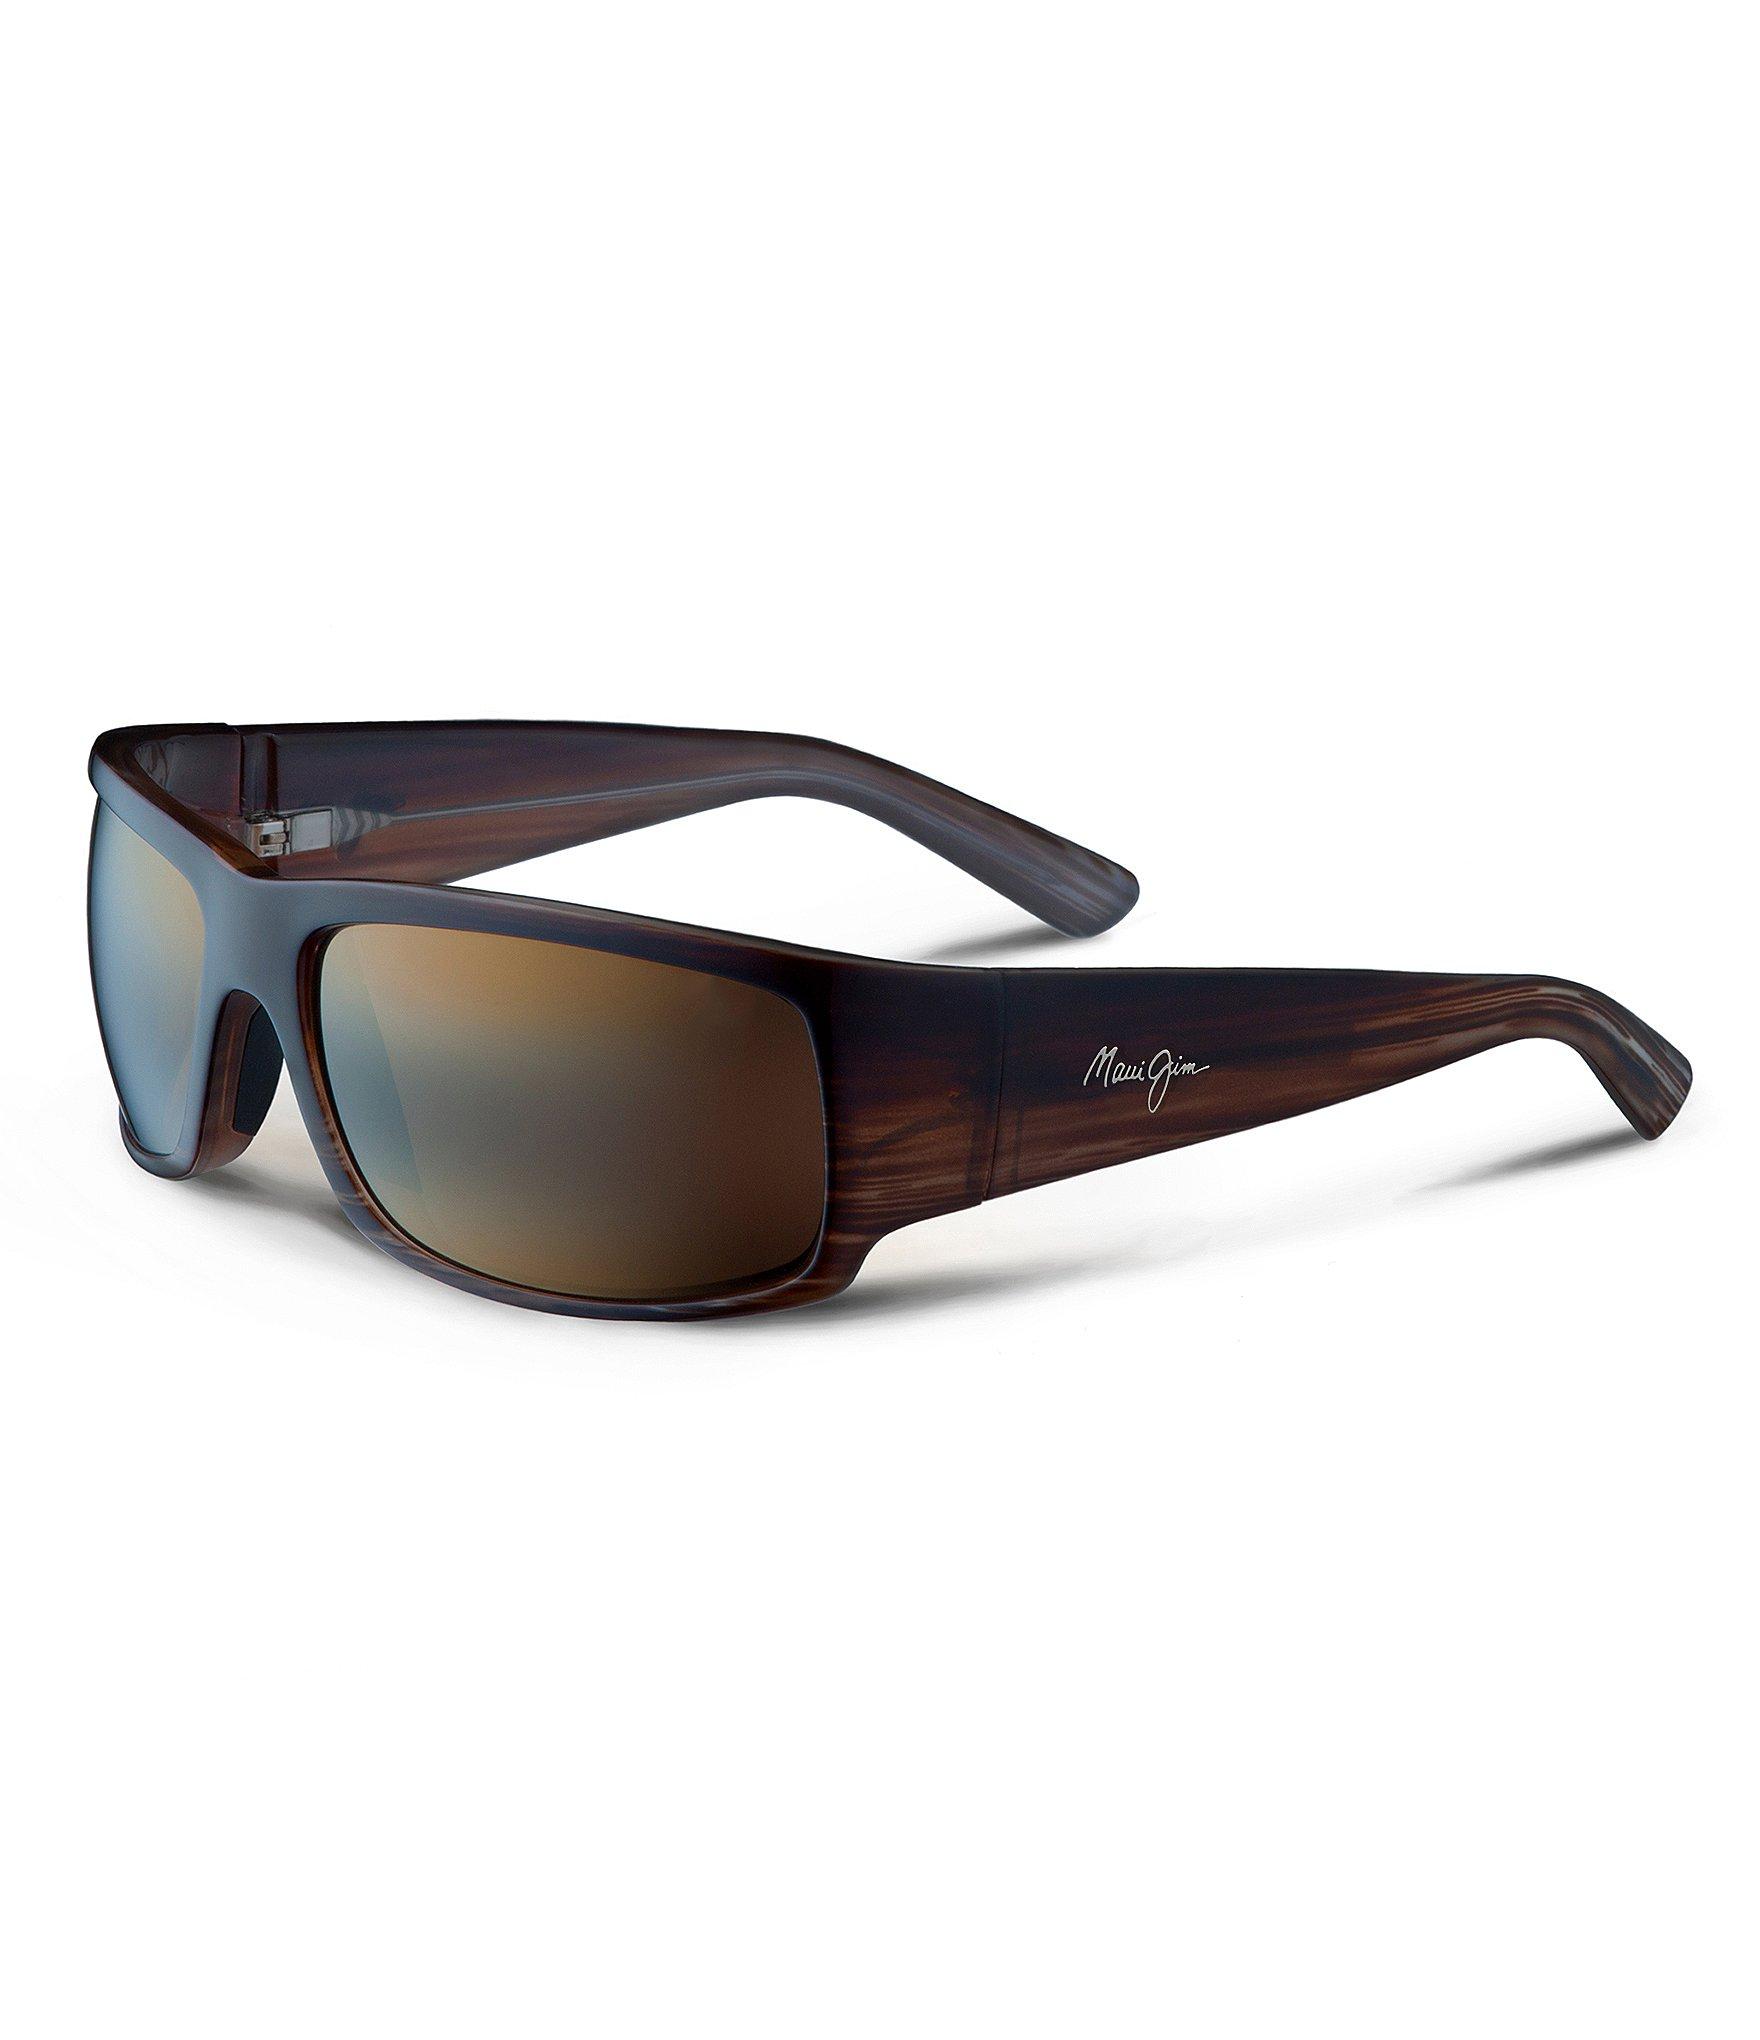 4ea66f12dd men's brown: Accessories: Jewelry, Watches & Sunglasses | Dillard's